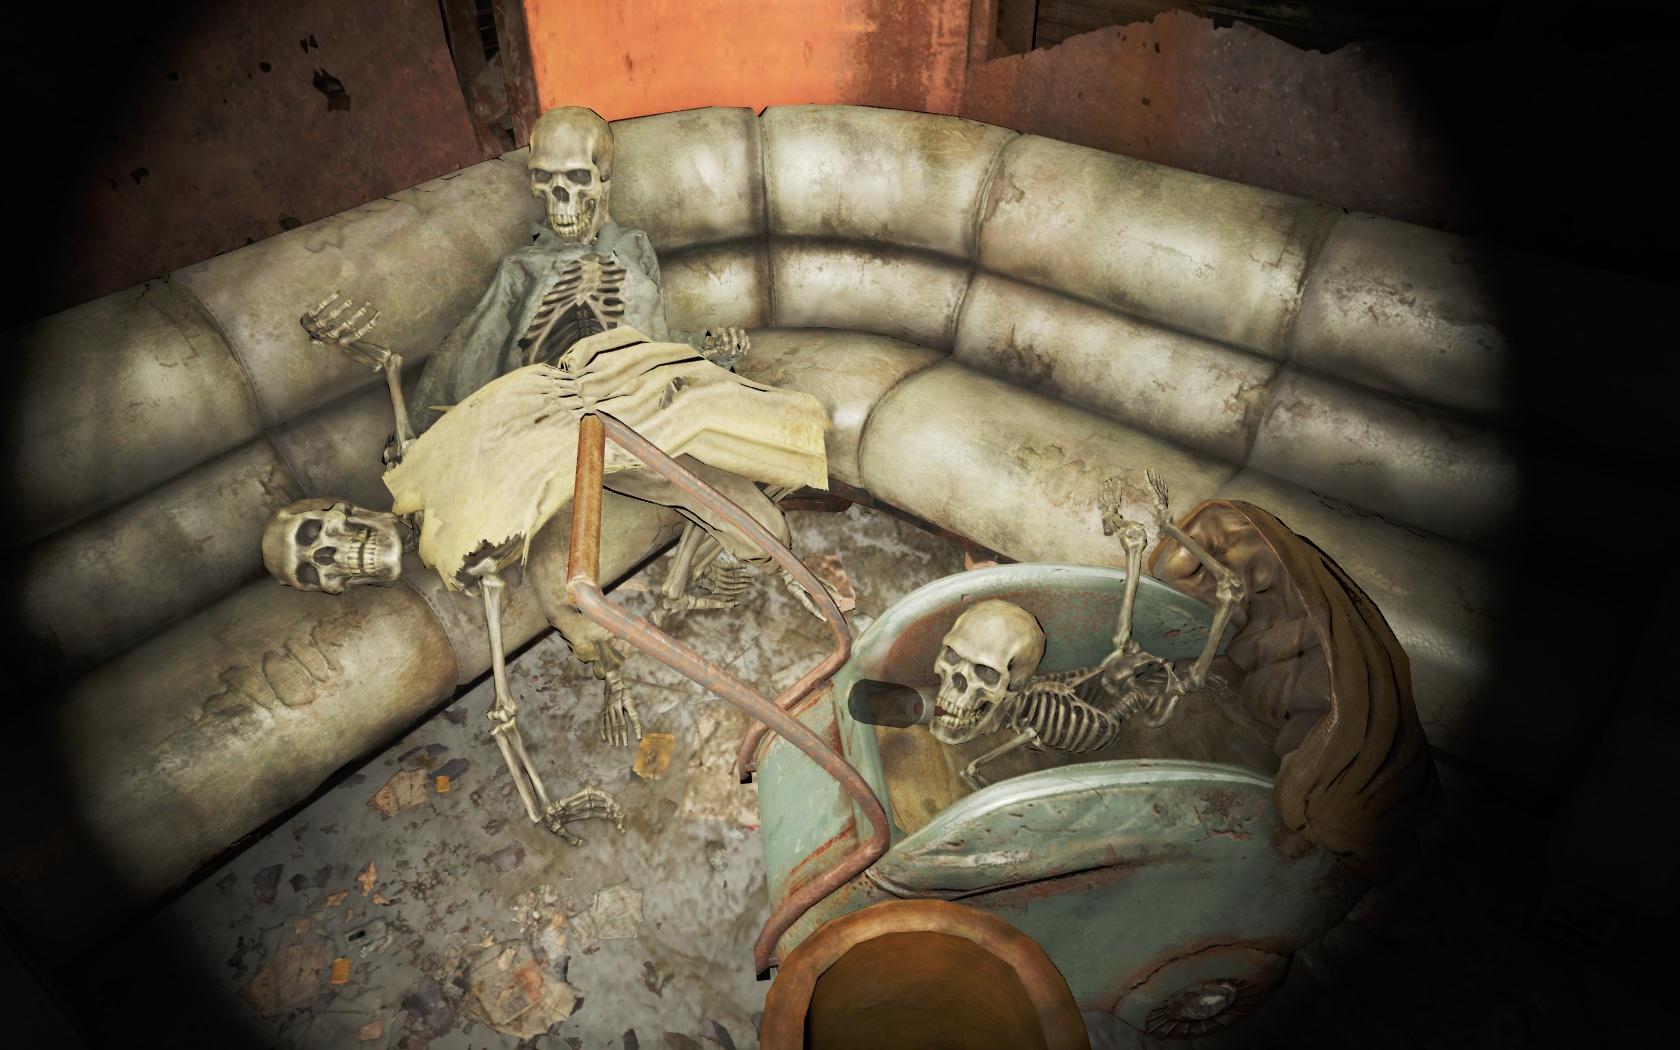 Странная семейка (Медцентр Массачусетс-Бэй) - Fallout 4 Массачусетс, Массачусетс-Бэй, Медцентр, Медцентр Массачусетс-Бэй, Скелет